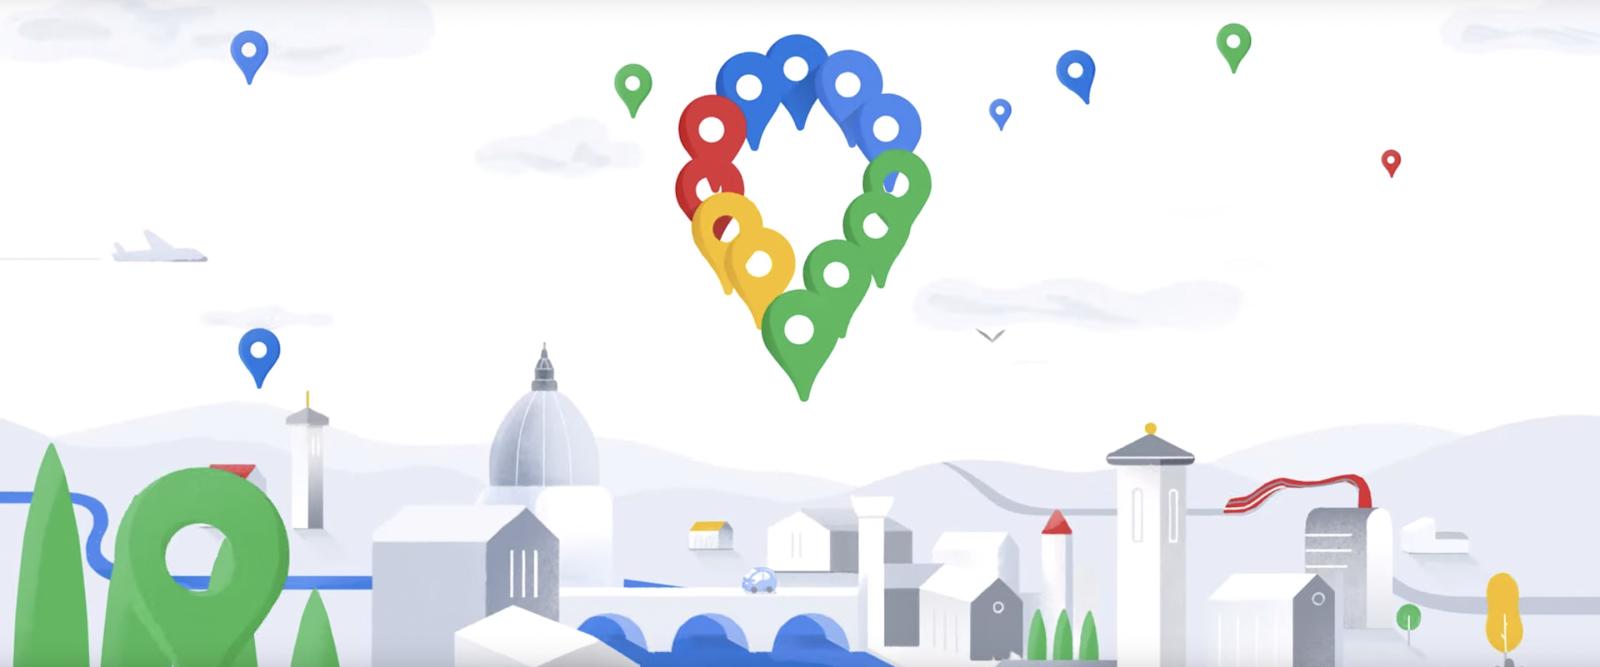 Googleマップが15周年。新しいアイコンと新機能が登場